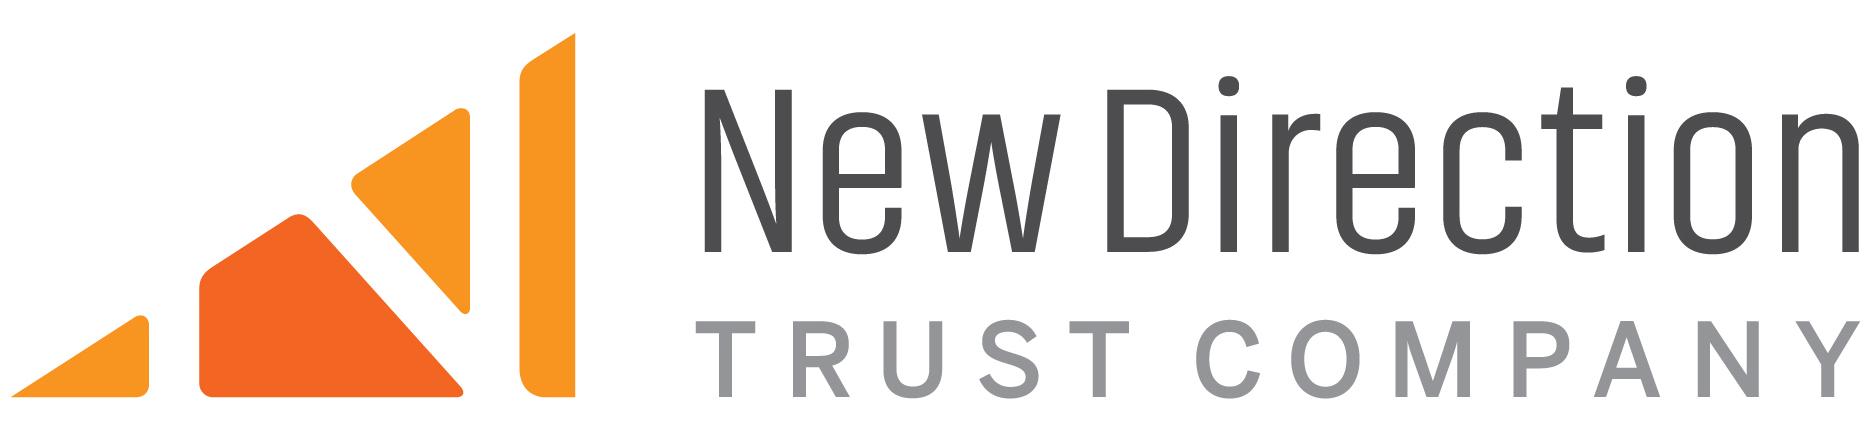 new direction trust company logo